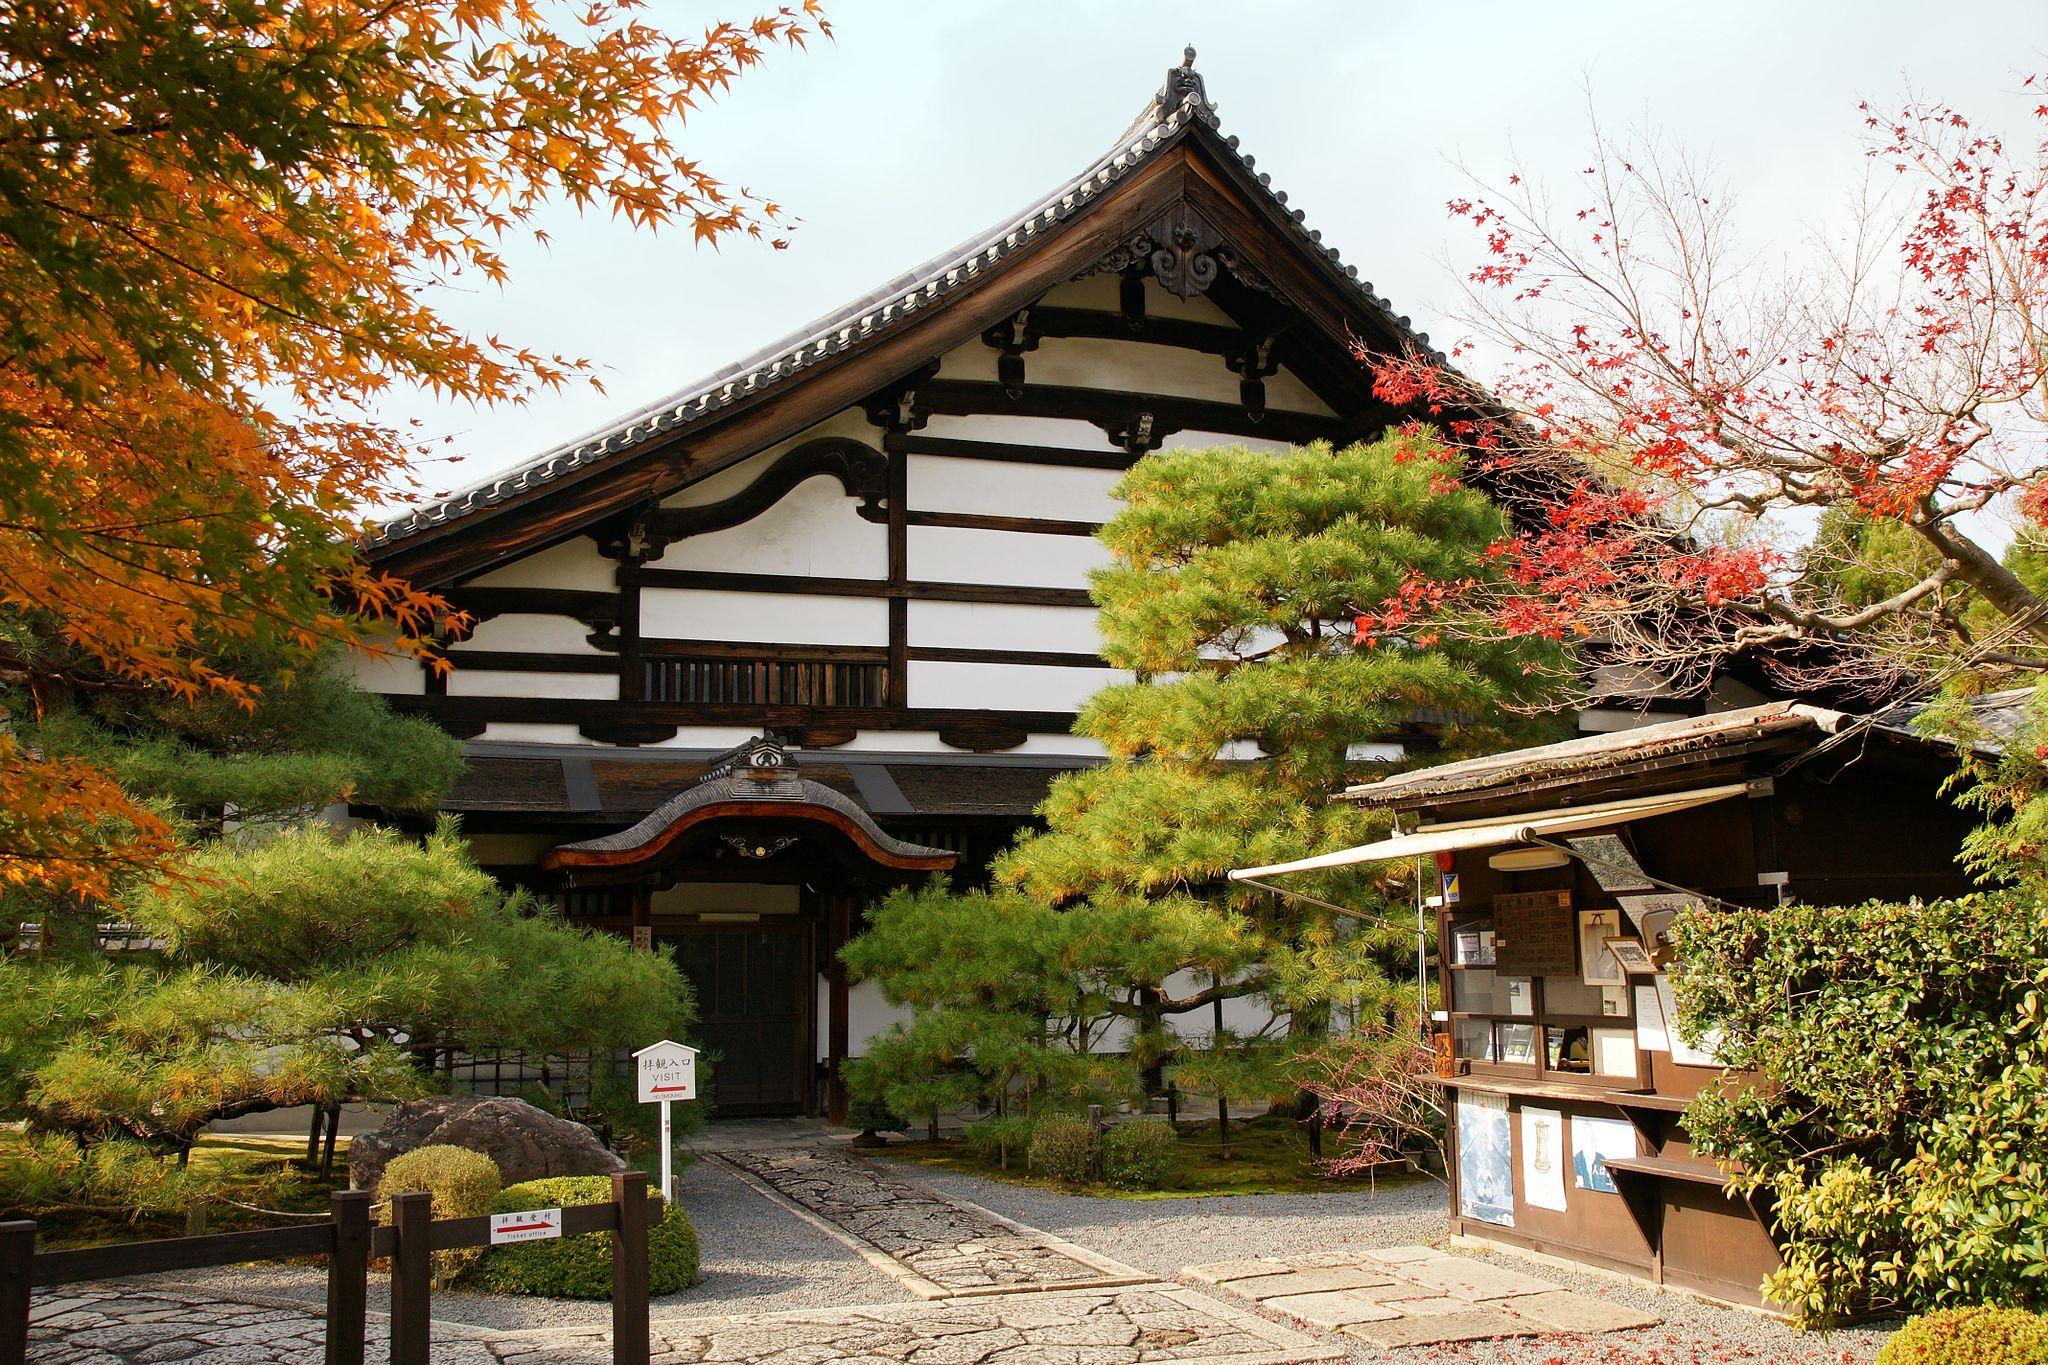 Konchi-in Temple at Nanzen-ji. Credit: 663highland. Licensed under CC BY-SA 3.0.